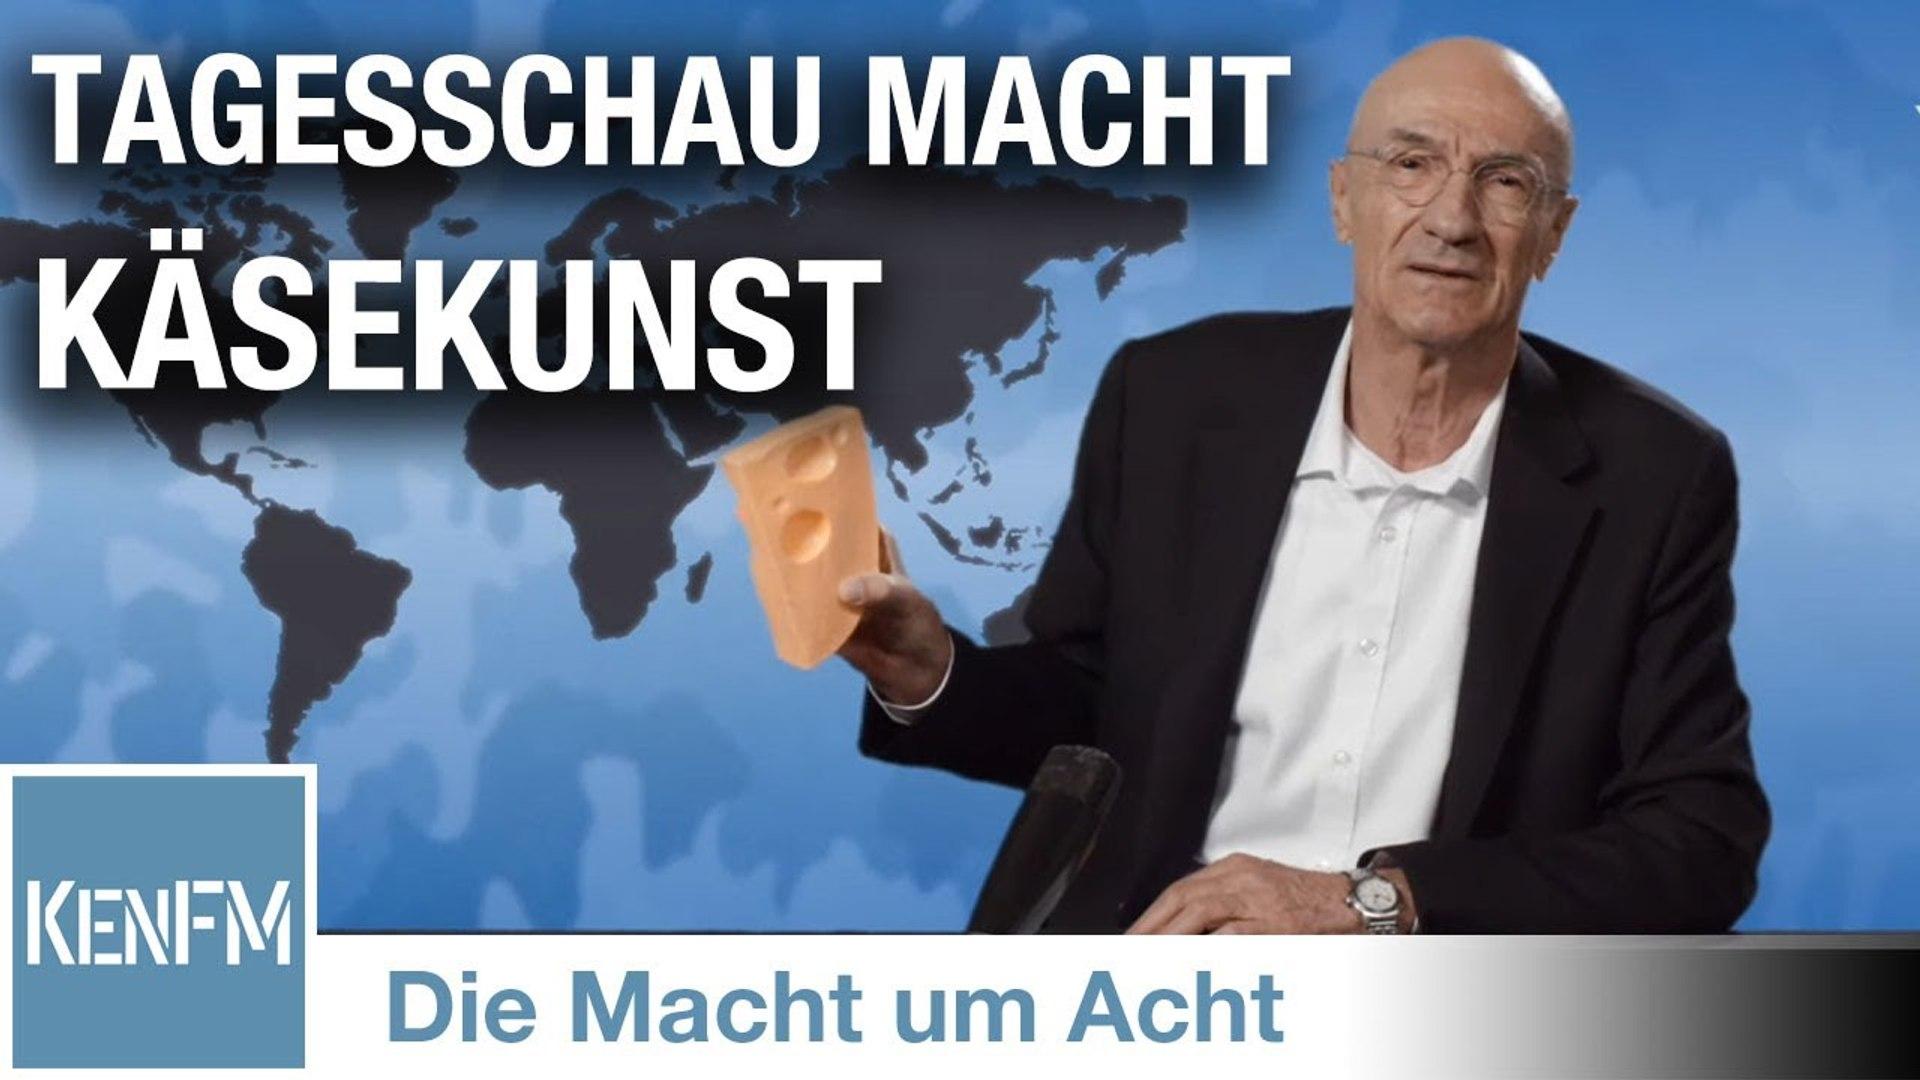 "Die Macht um Acht (53) ""Tagesschau übt Käsekunst aus."""